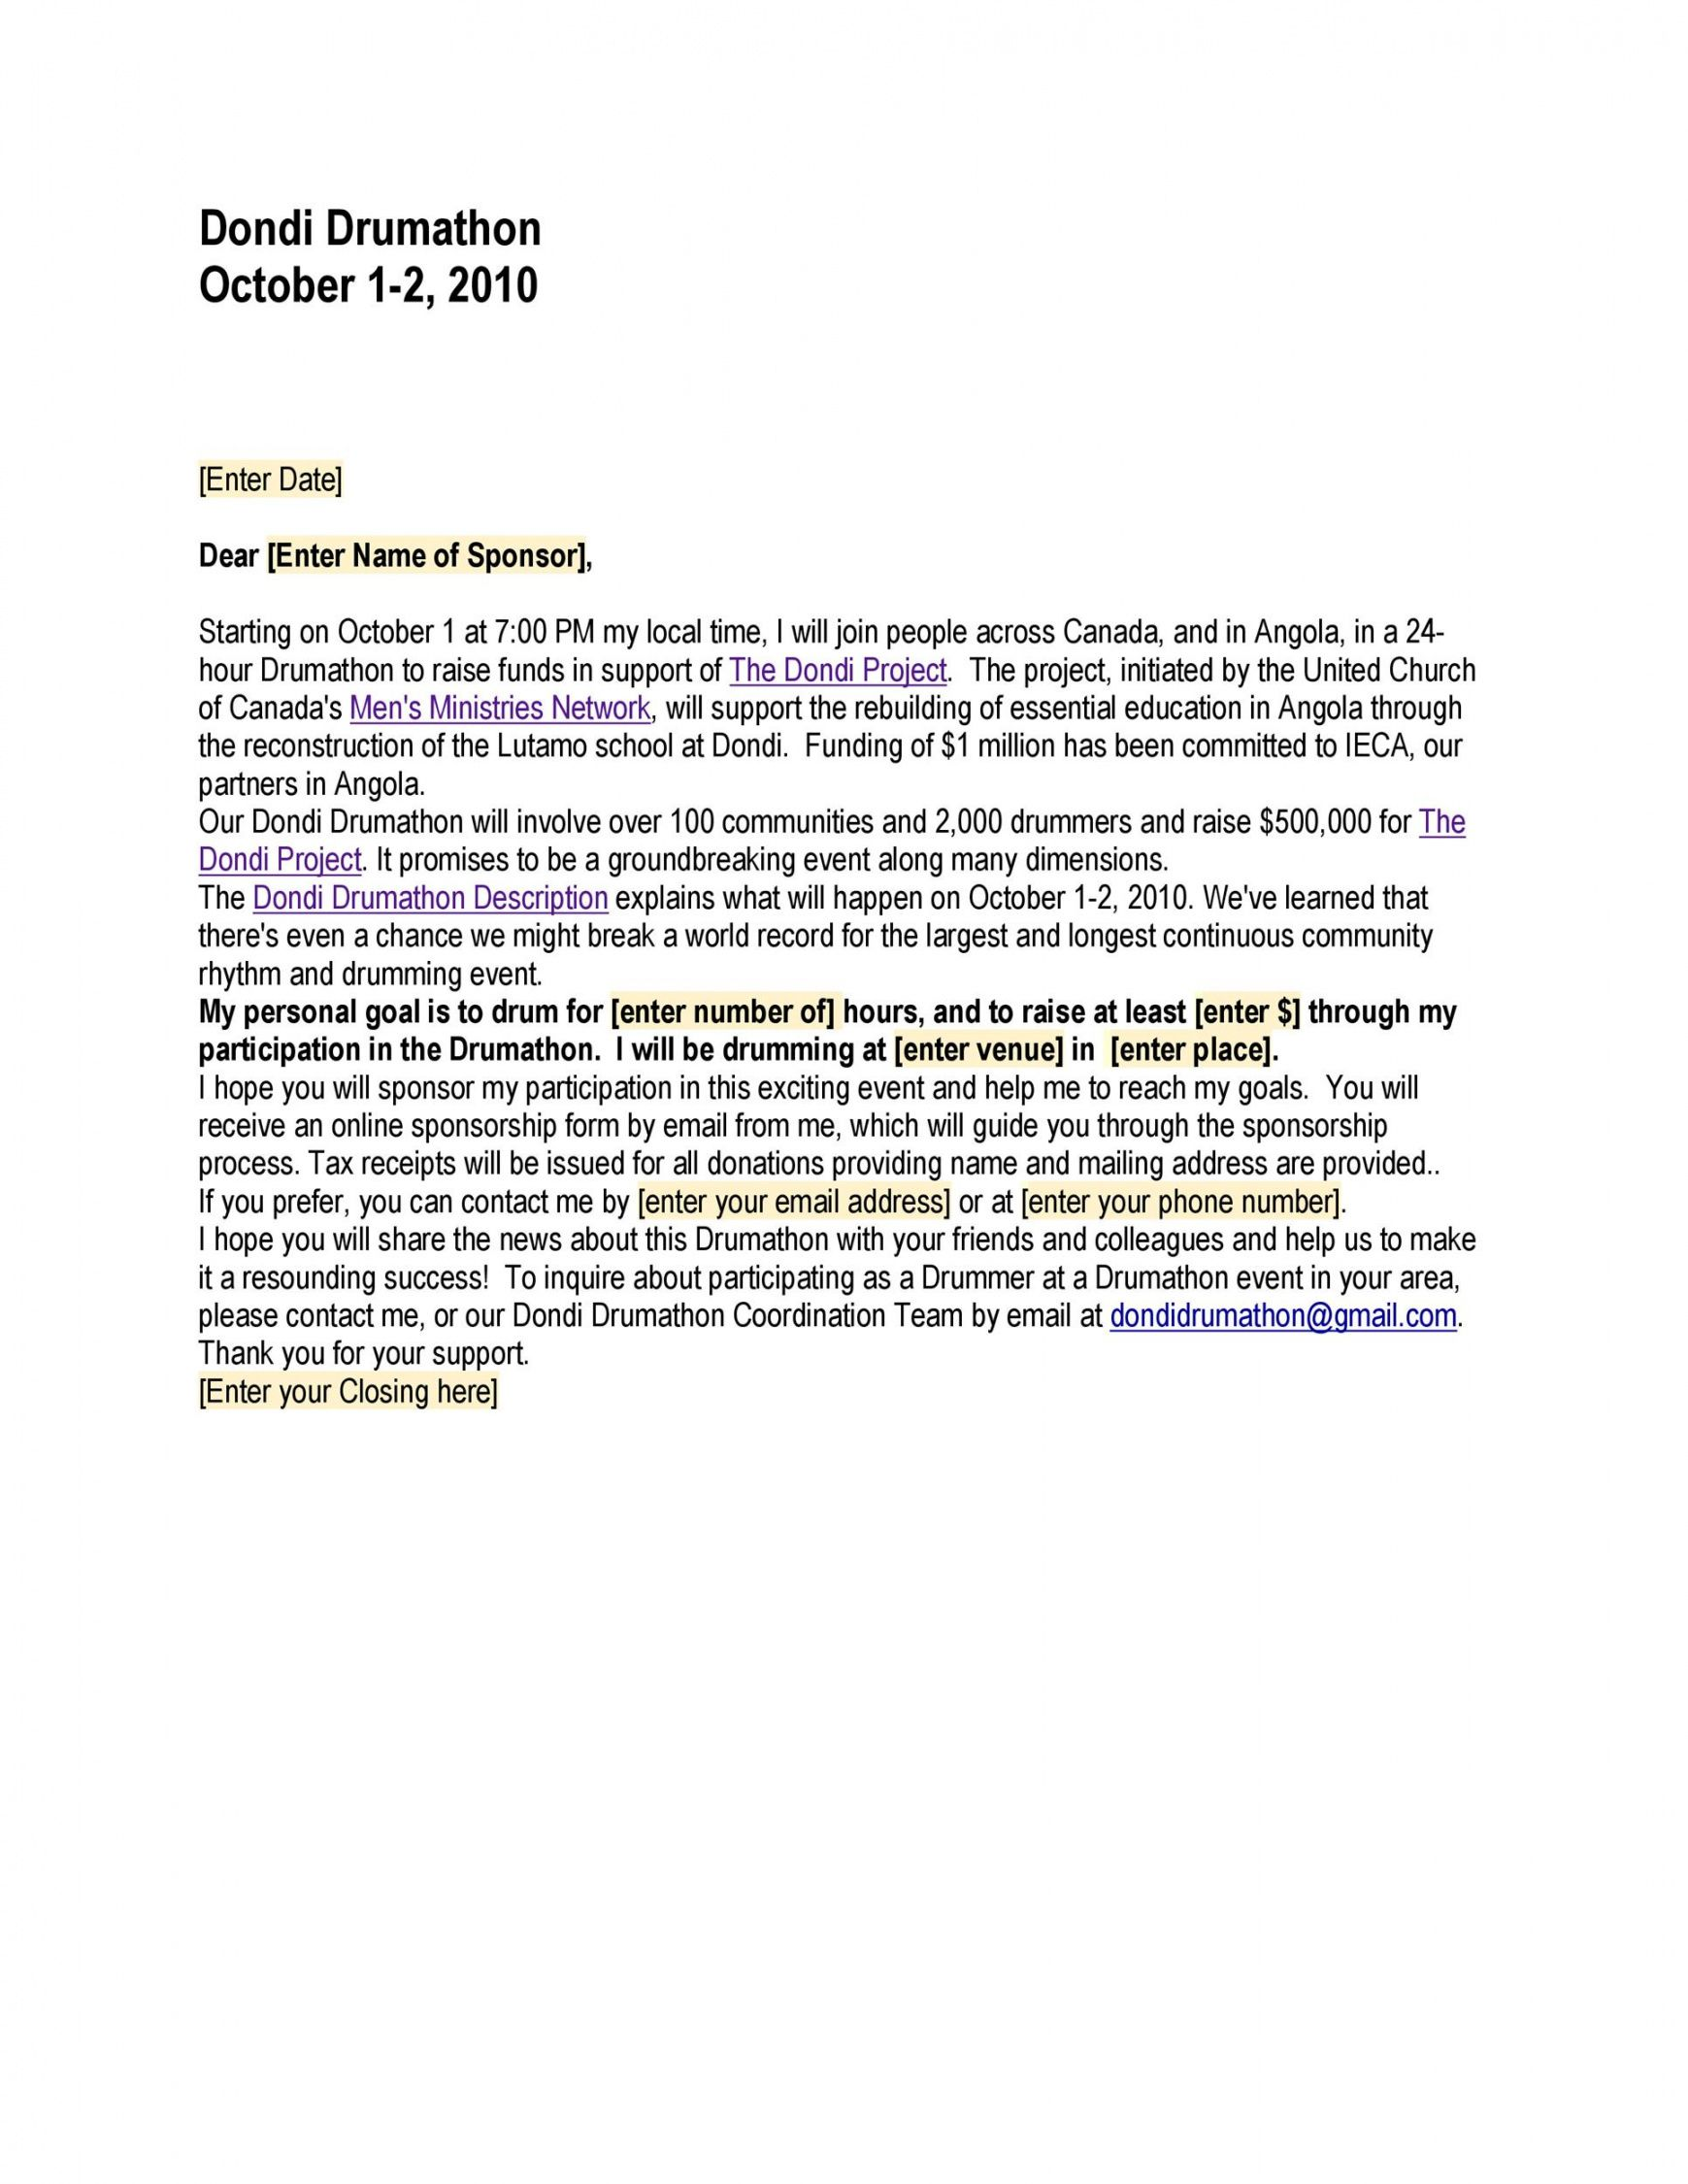 40 sponsorship letter & sponsorship proposal templates athlete sponsorship proposal template word